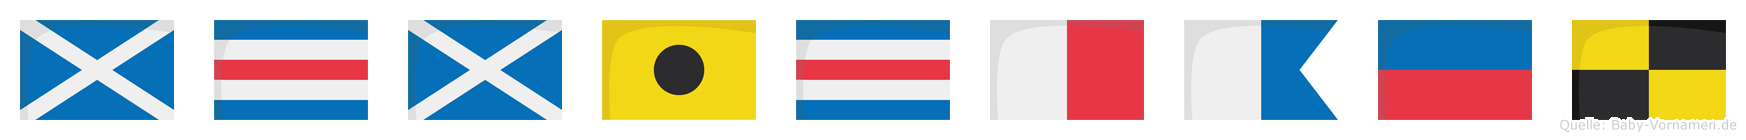 Mcmichael im Flaggenalphabet